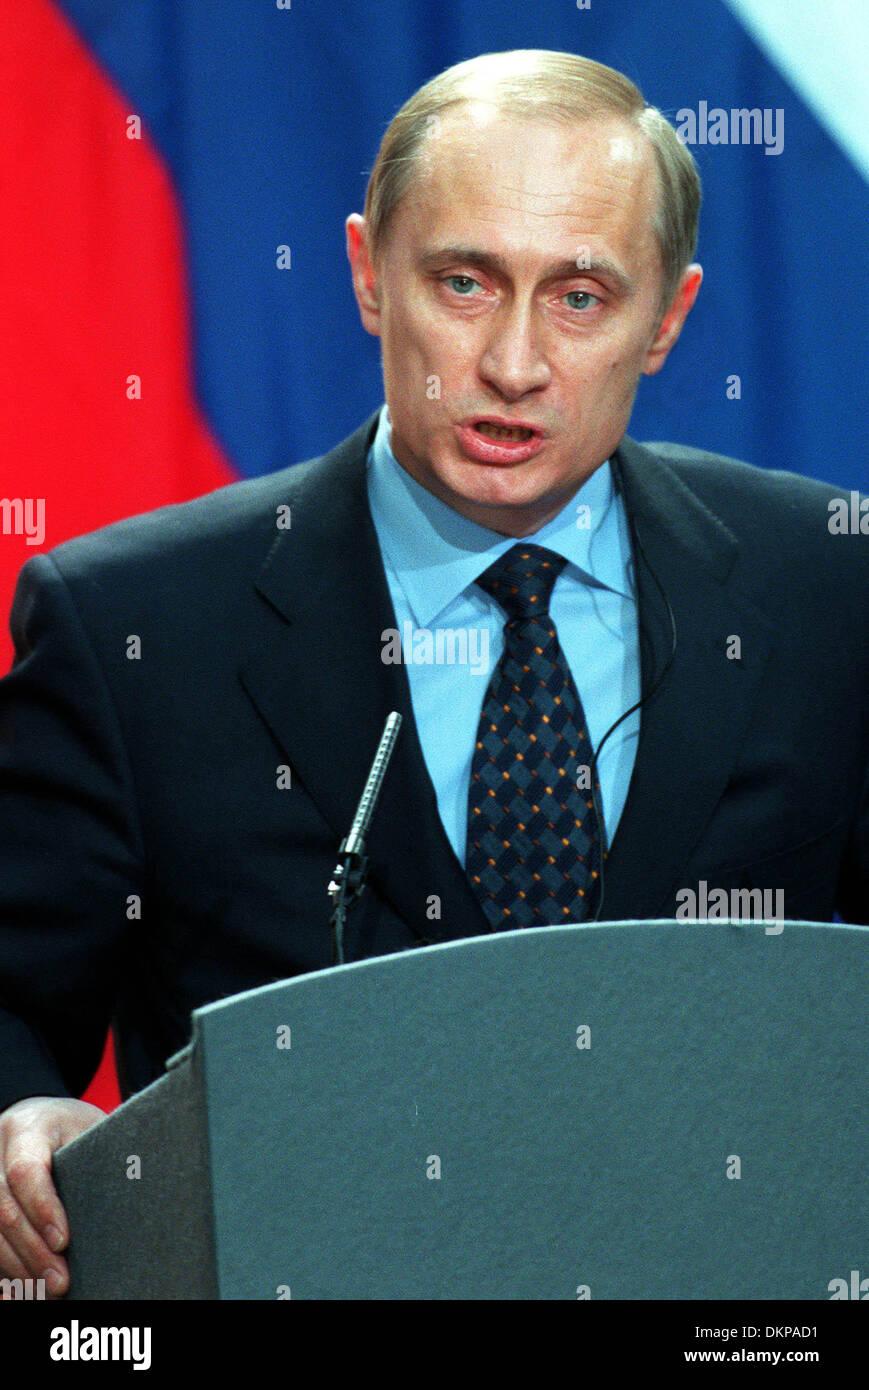 VLADIMIR PUTIN.PRESIDENT OF RUSSIA.17/04/2000.U22B13 - Stock Image